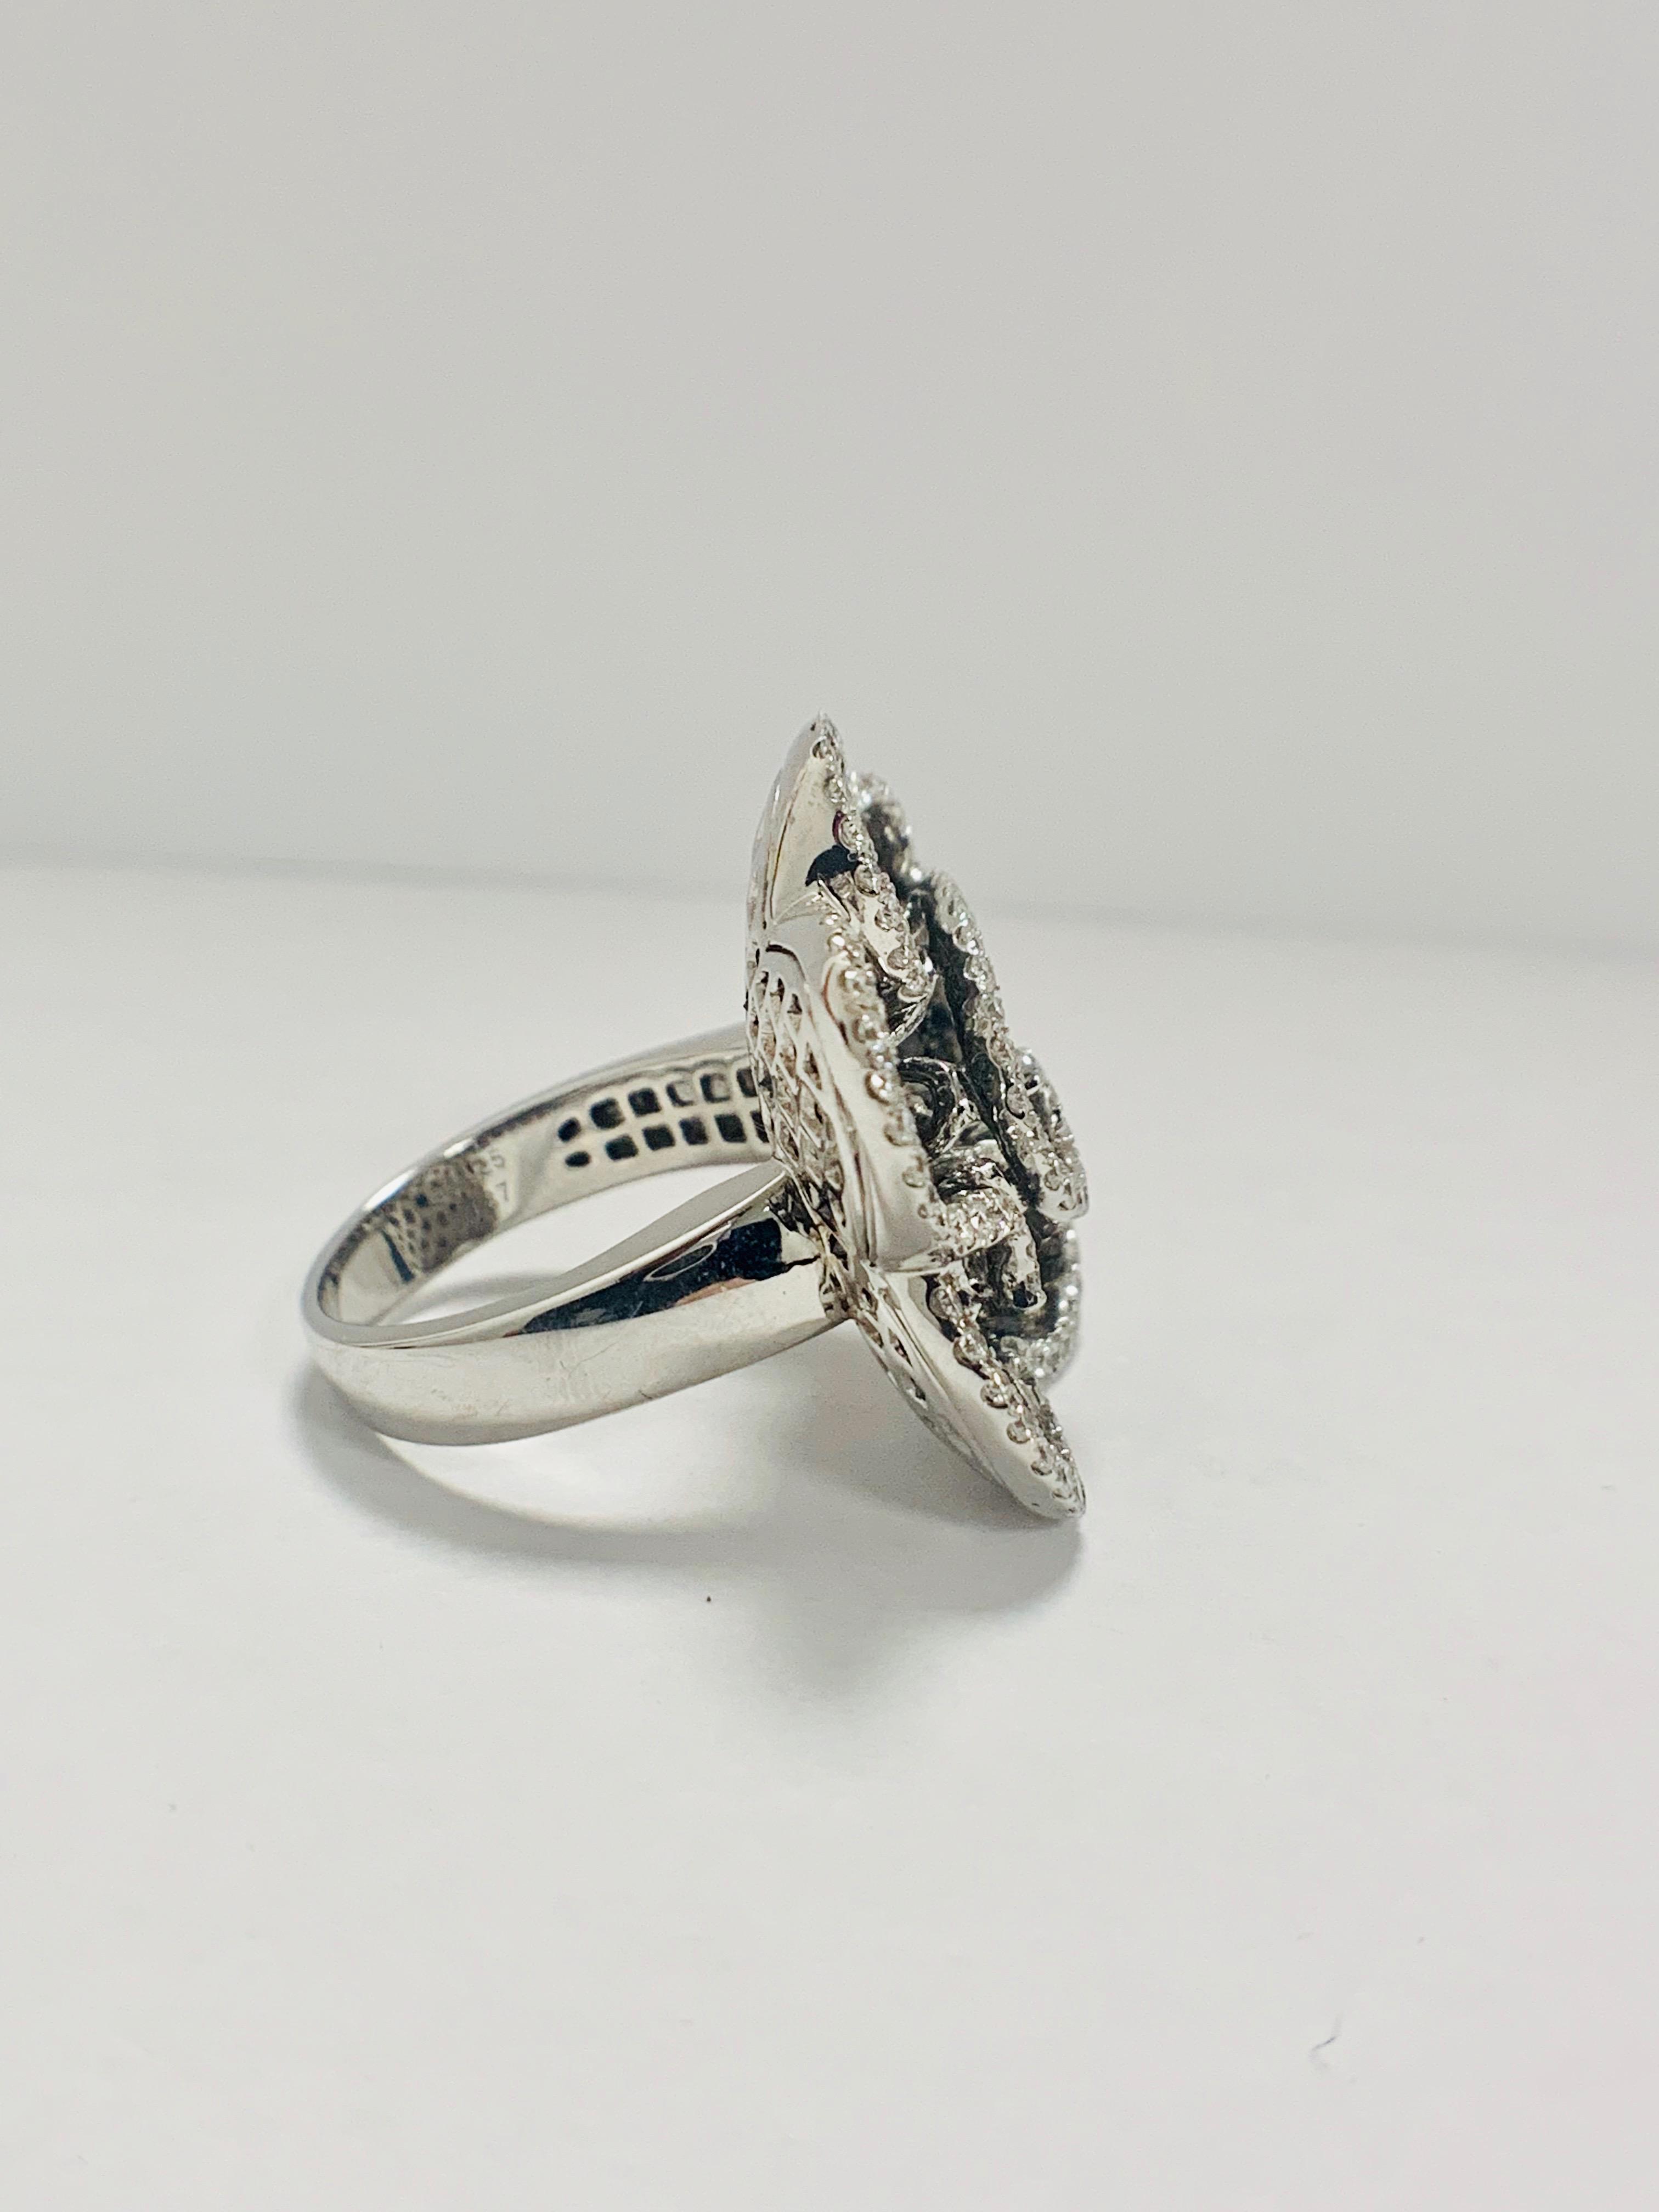 Lot 56 - 18ct White Gold Diamond flower design ring featuring 123 round cut, black Diamonds (2.25ct TBDW)